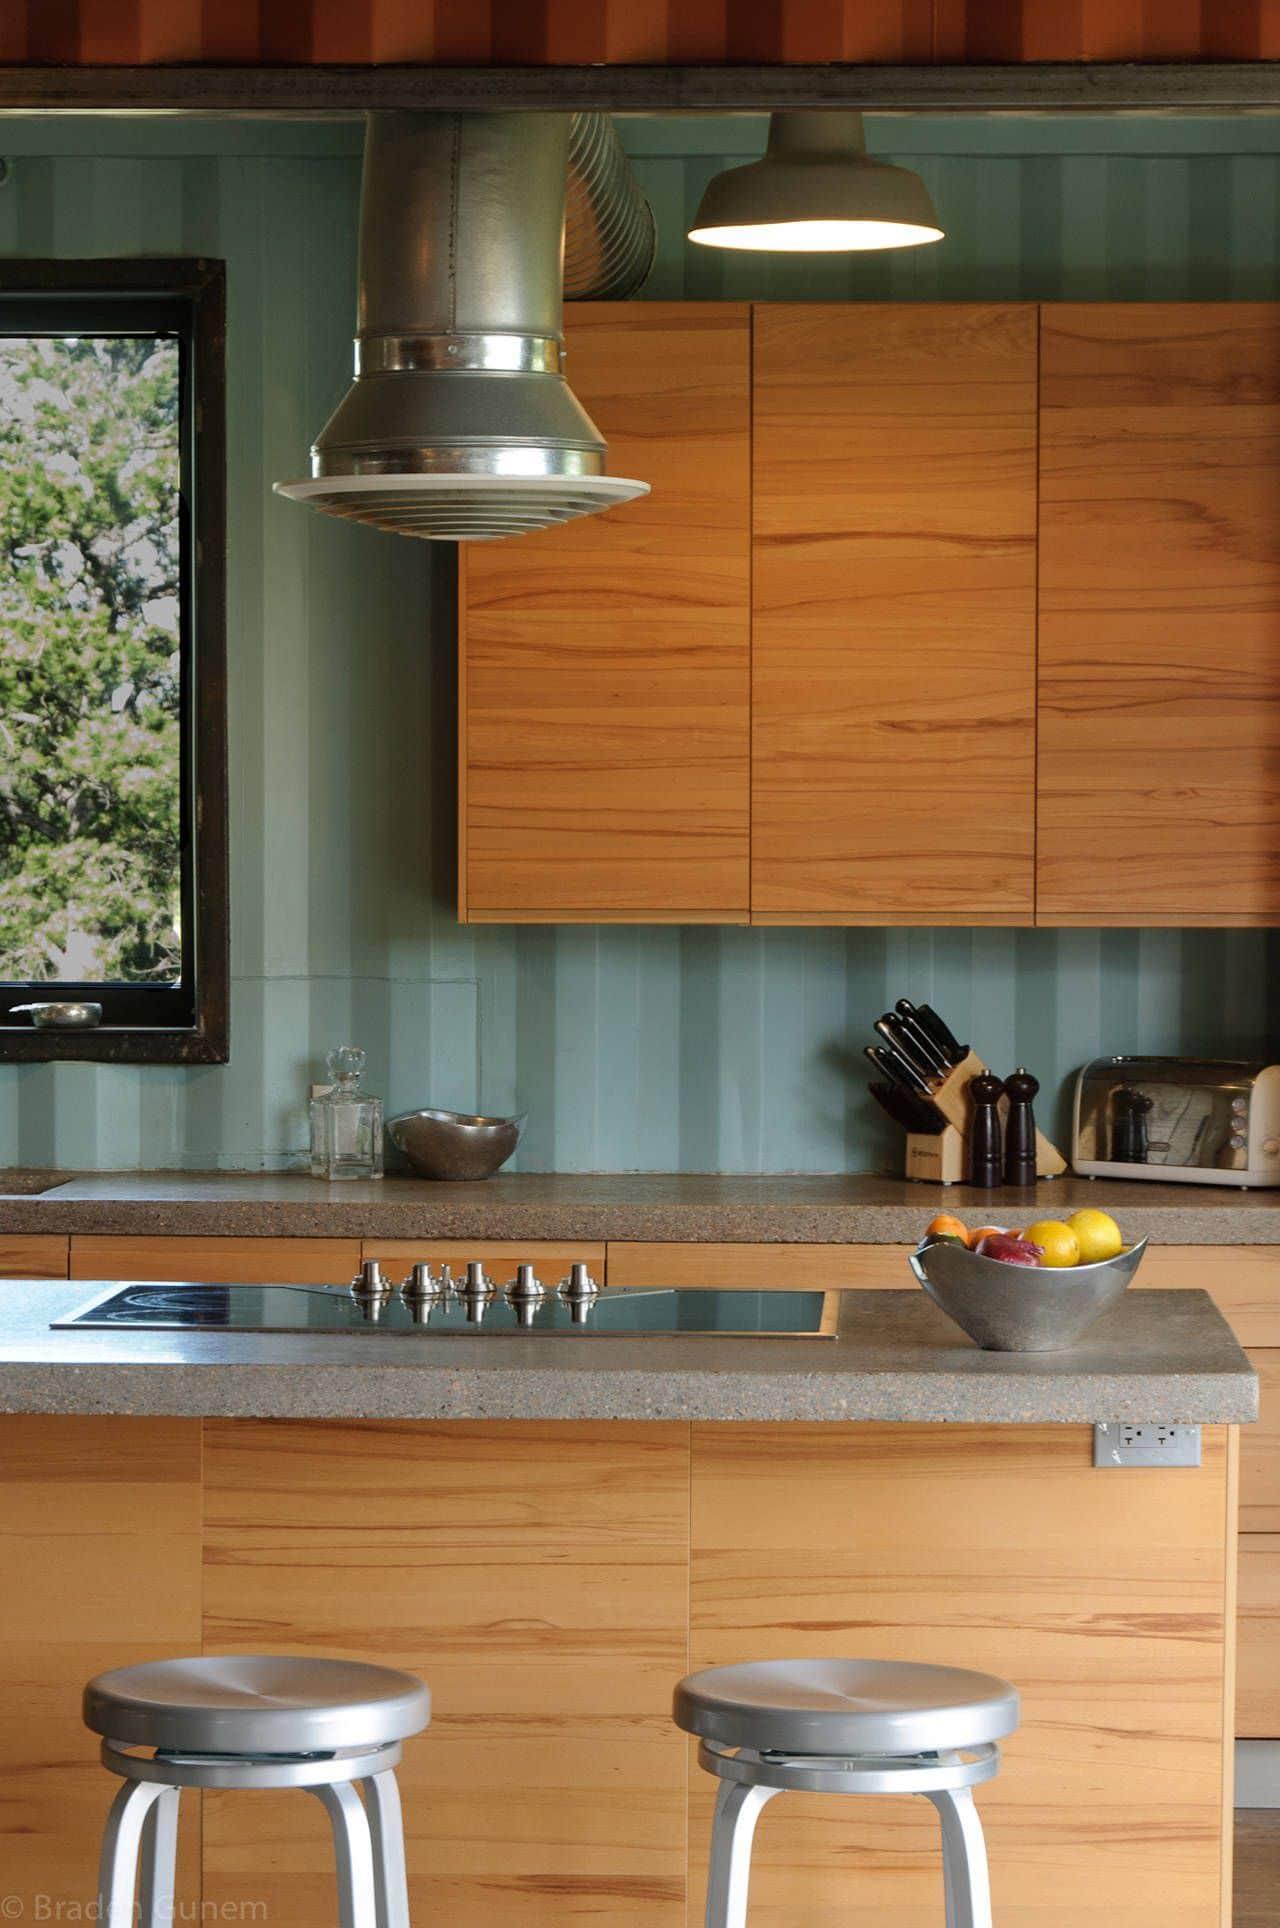 Dise o de cocina en casa contenedor construye hogar - Construye hogar ...